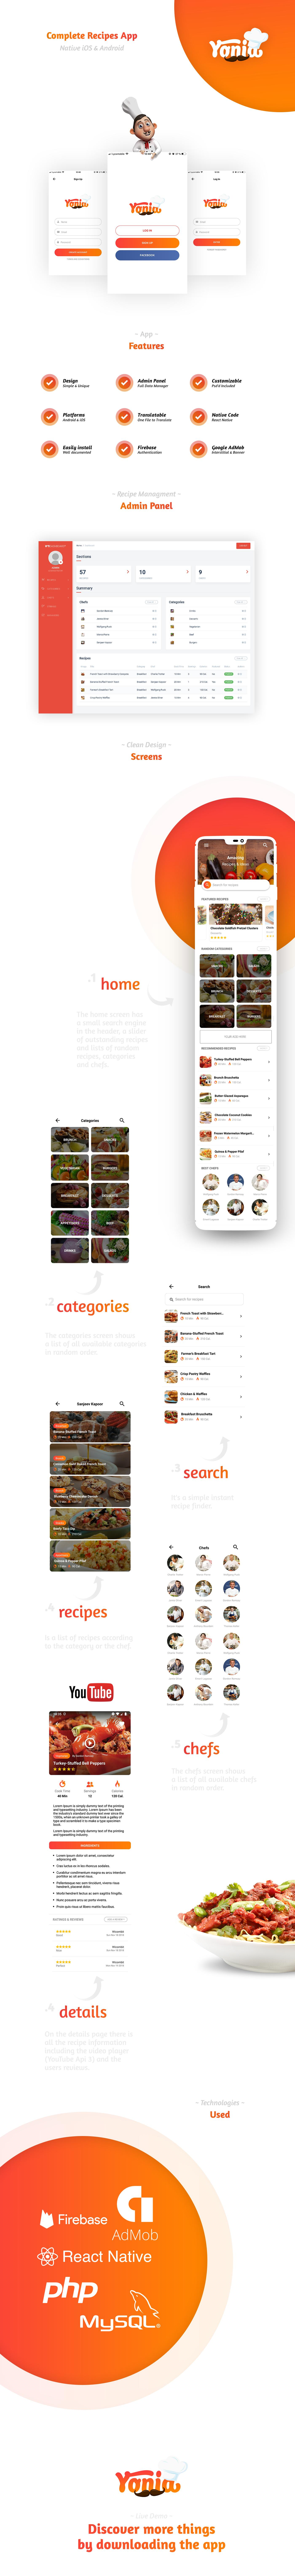 Yonia - Complete React Native Recipes App + Admin Panel - 2